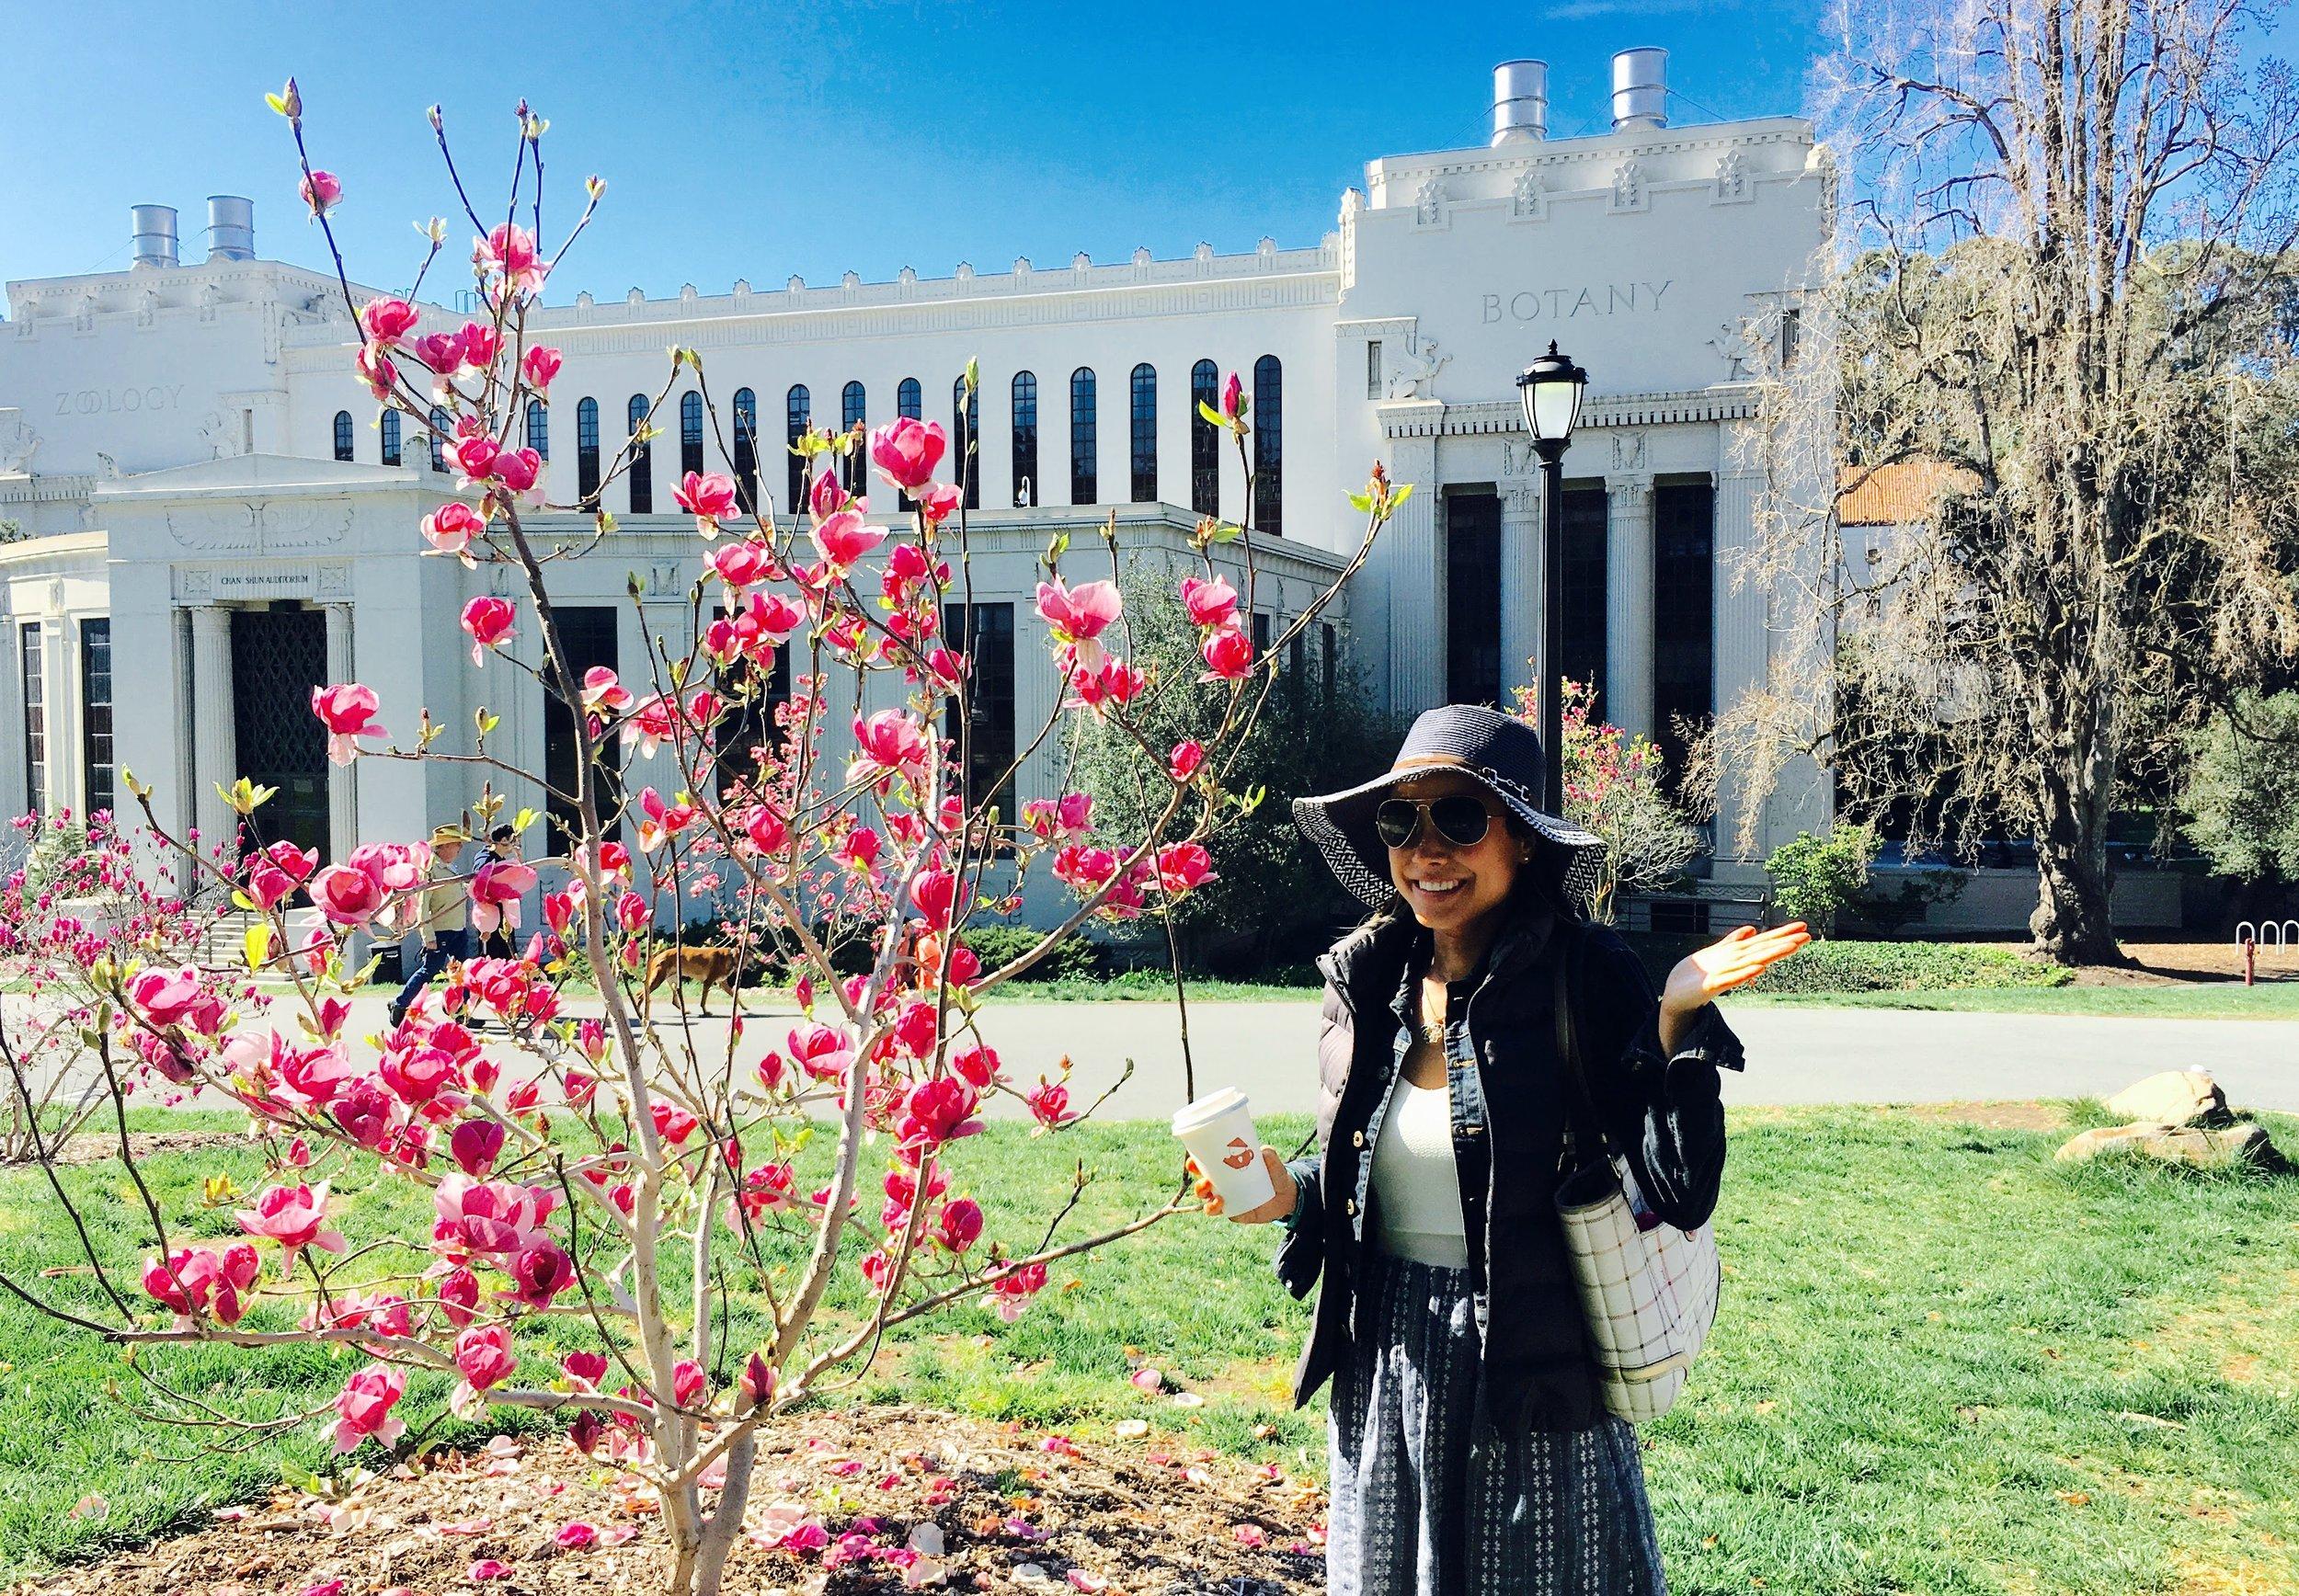 Post-Graduation I Roaming Around the Gorgeous UC Berkeley Campus